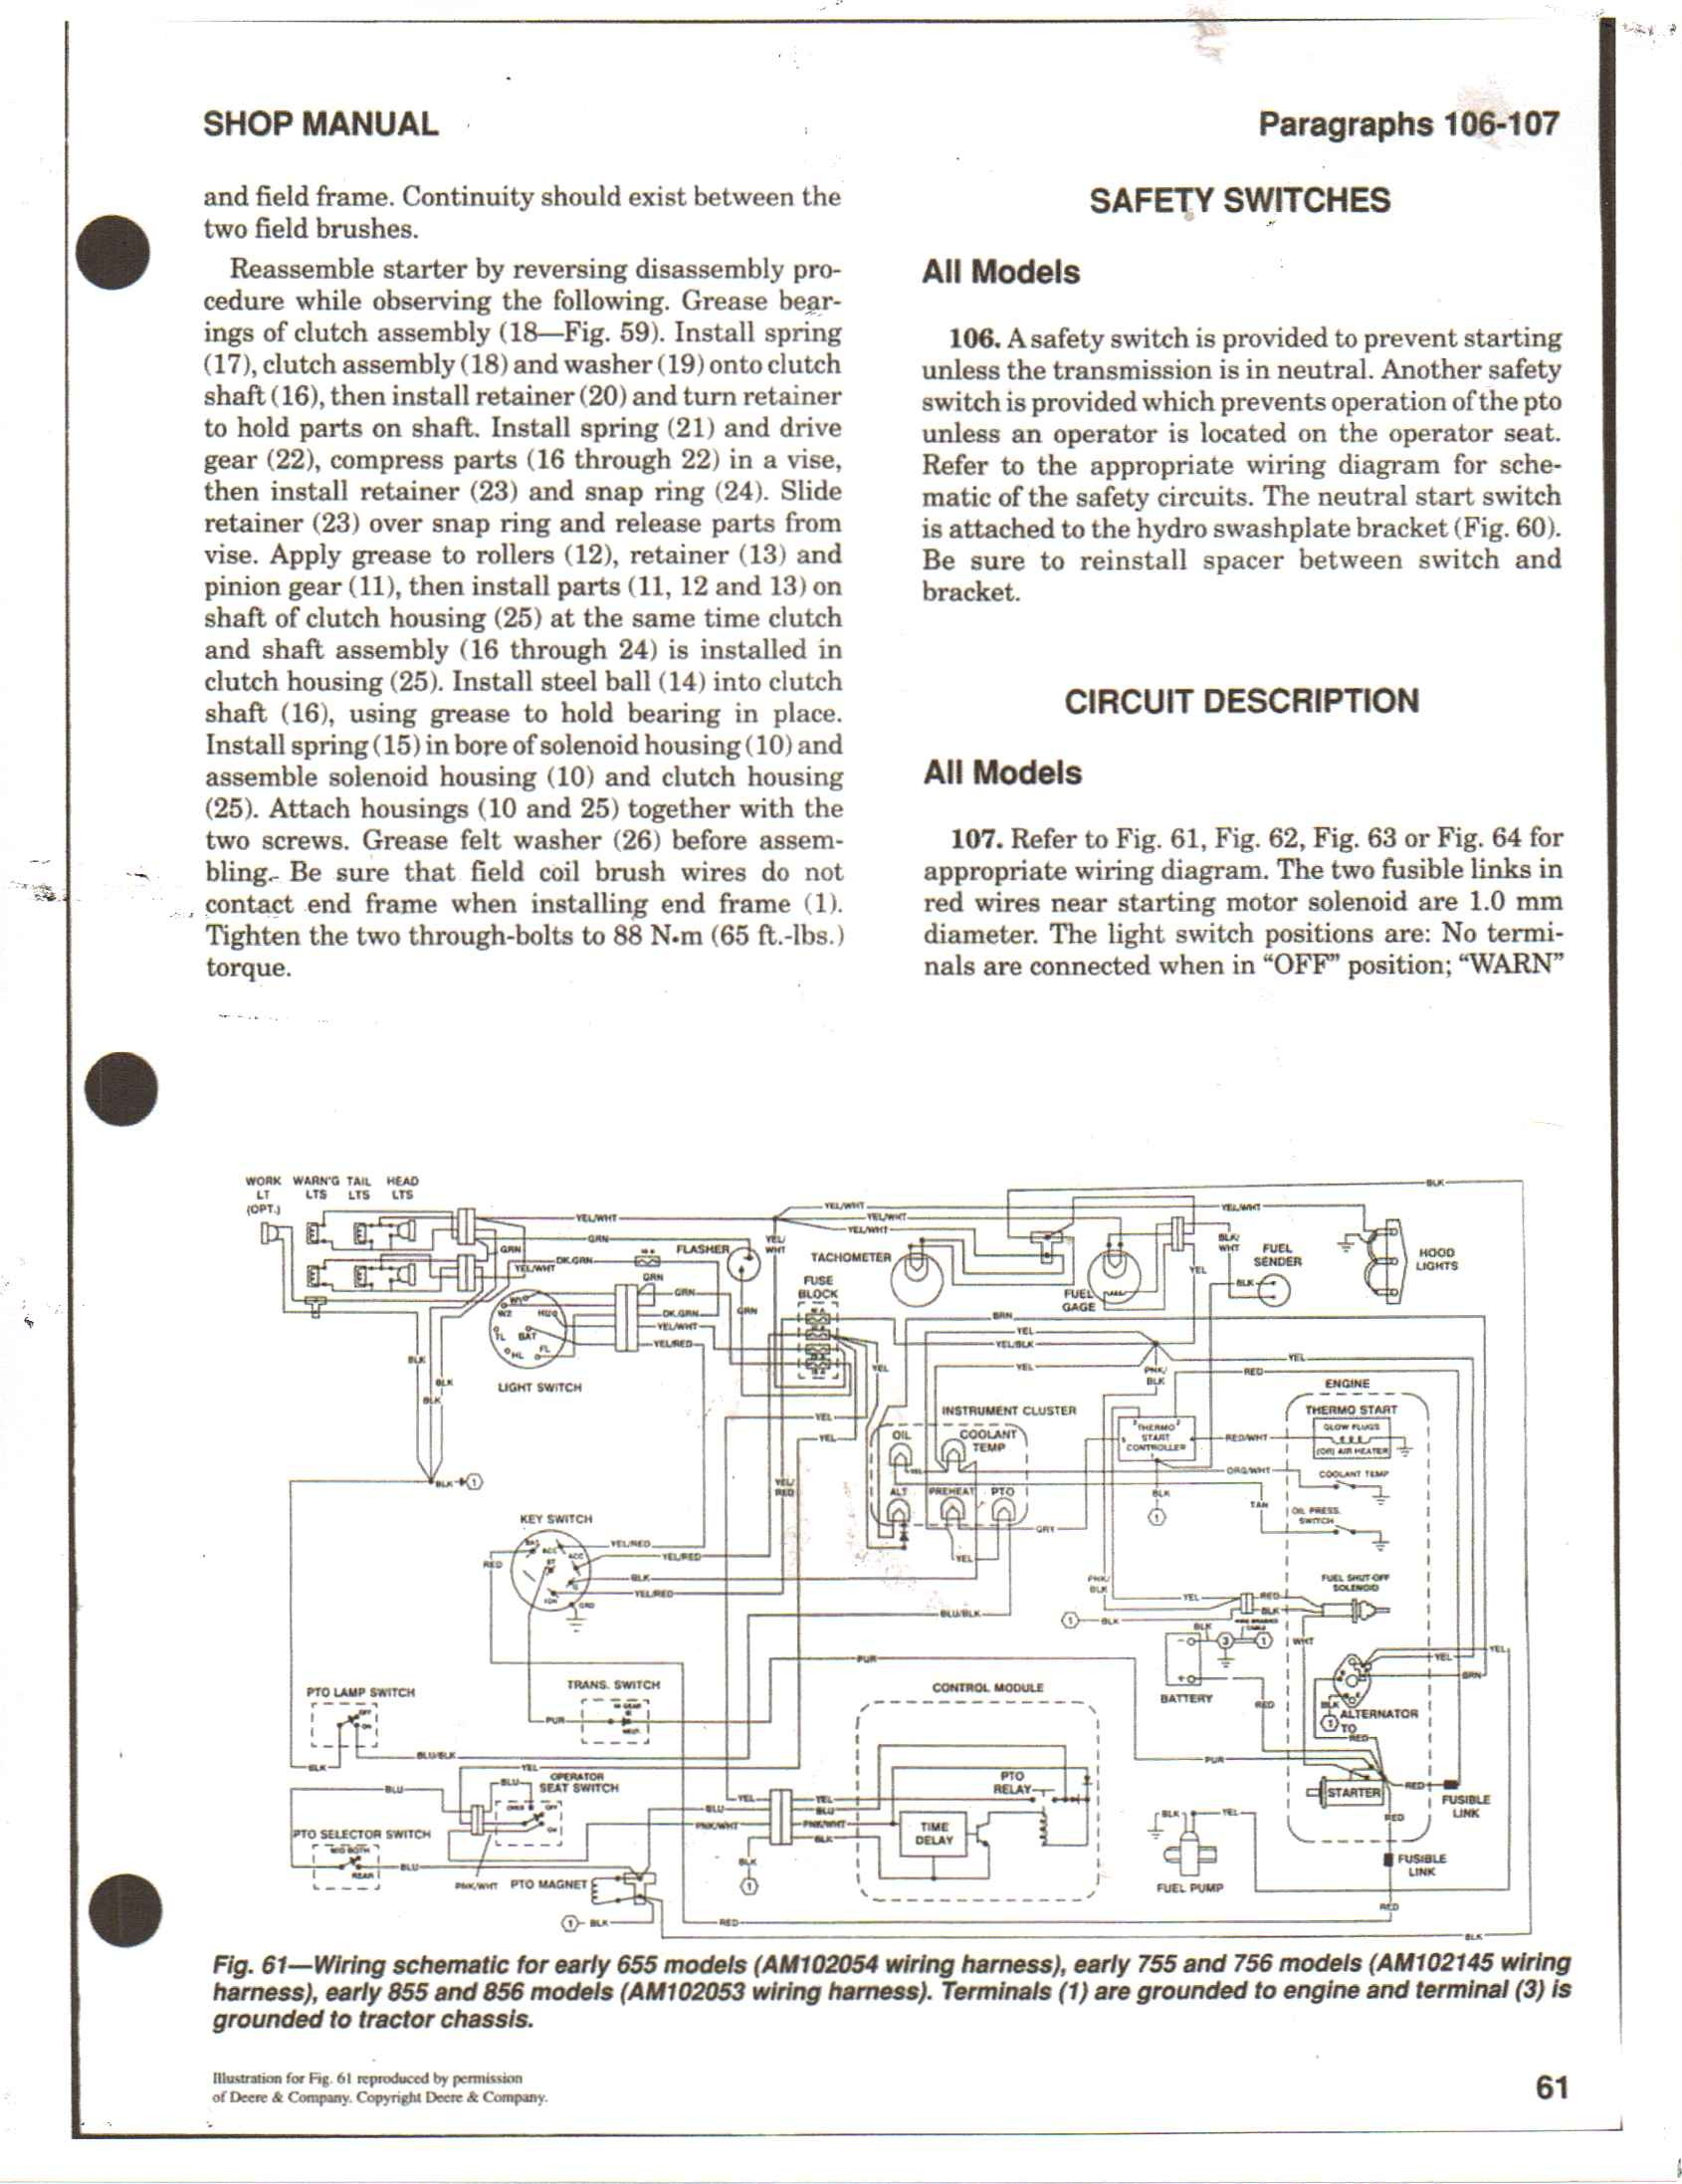 John Deere Gx345 Wiring Diagram 56d25 John Deere 655 Wiring Diagram Of John Deere Gx345 Wiring Diagram